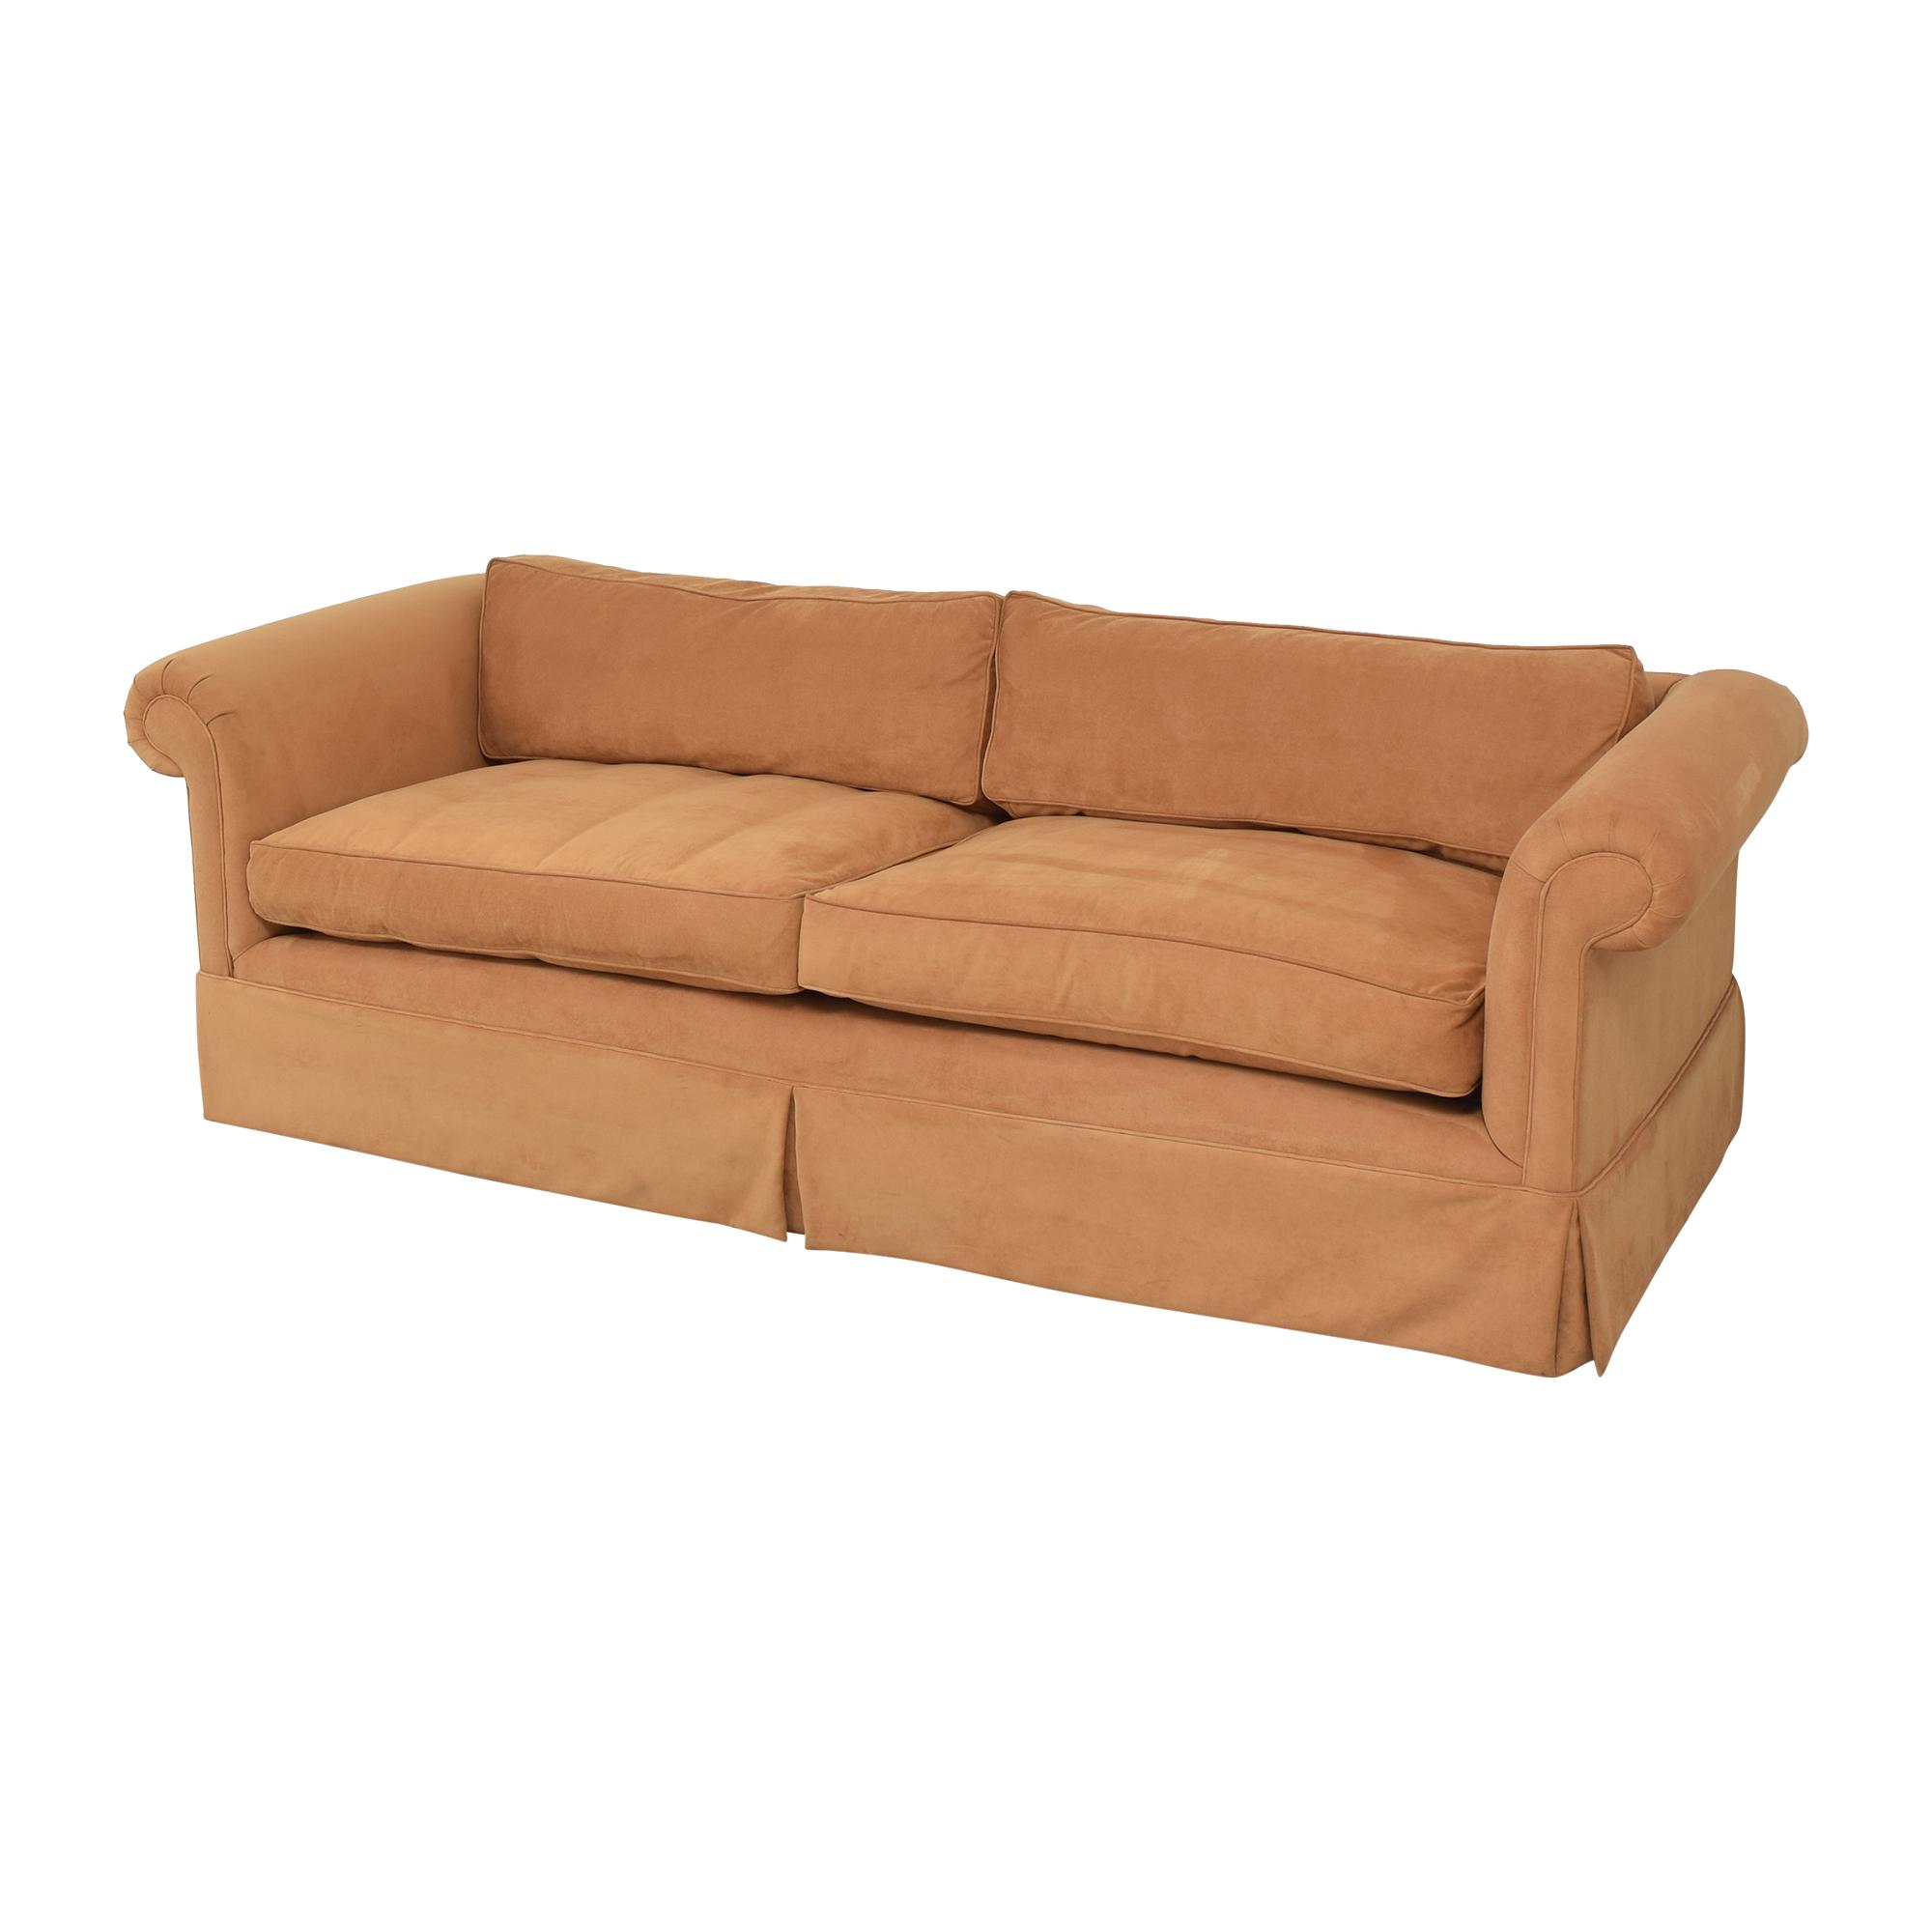 Custom Roll Arm Sofa on sale